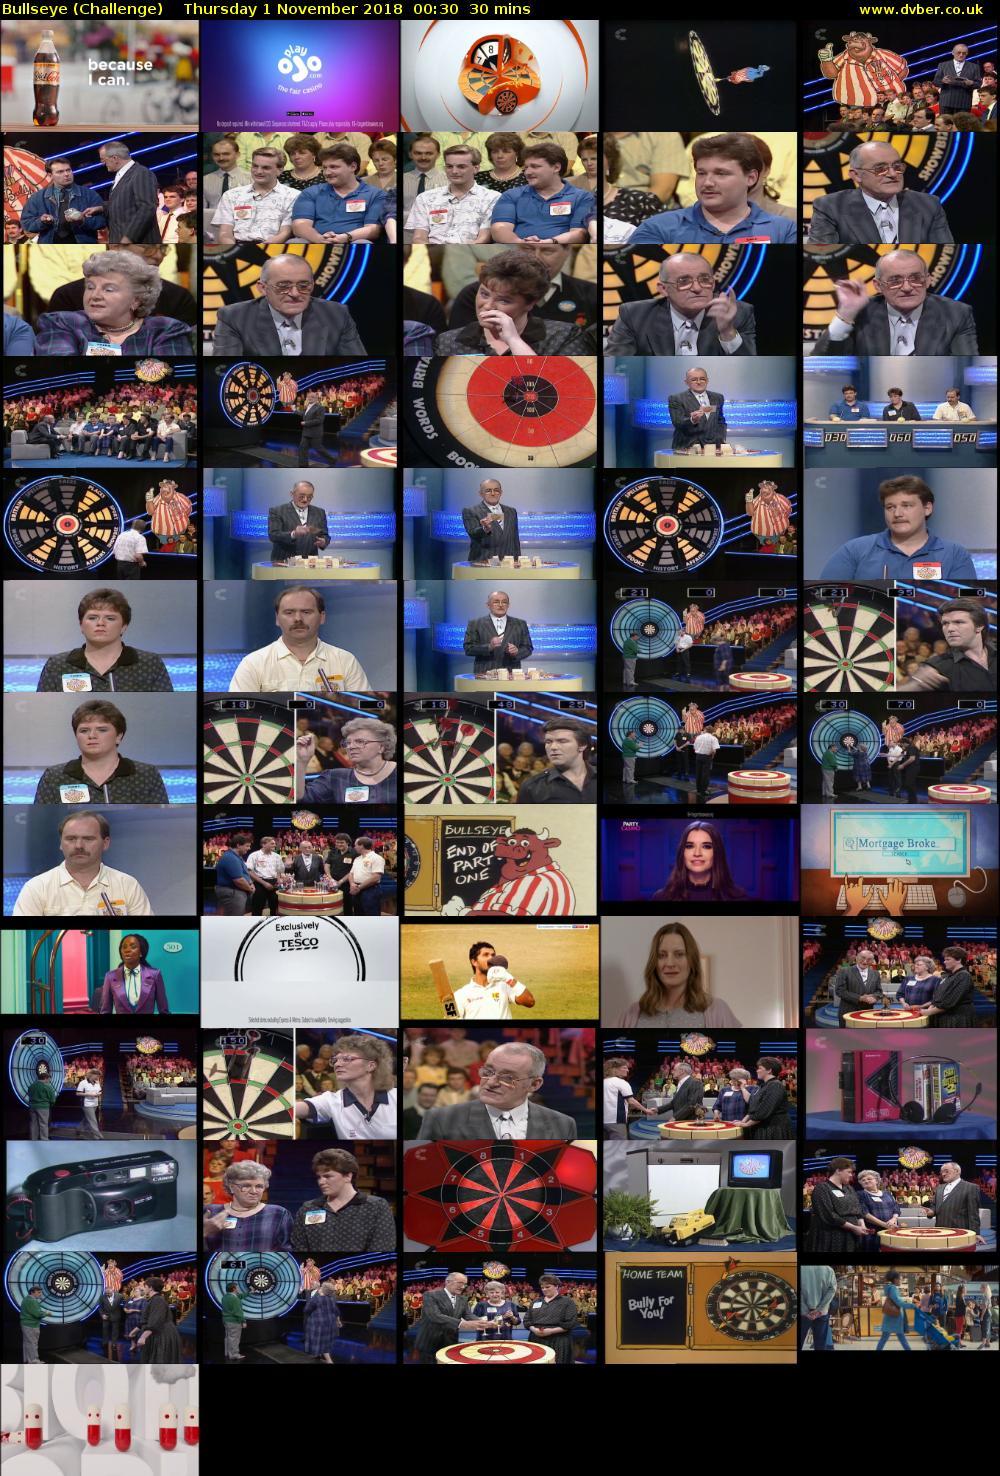 Bulls-eye Stock Photos, Stock Images and Vectors | Stockfresh